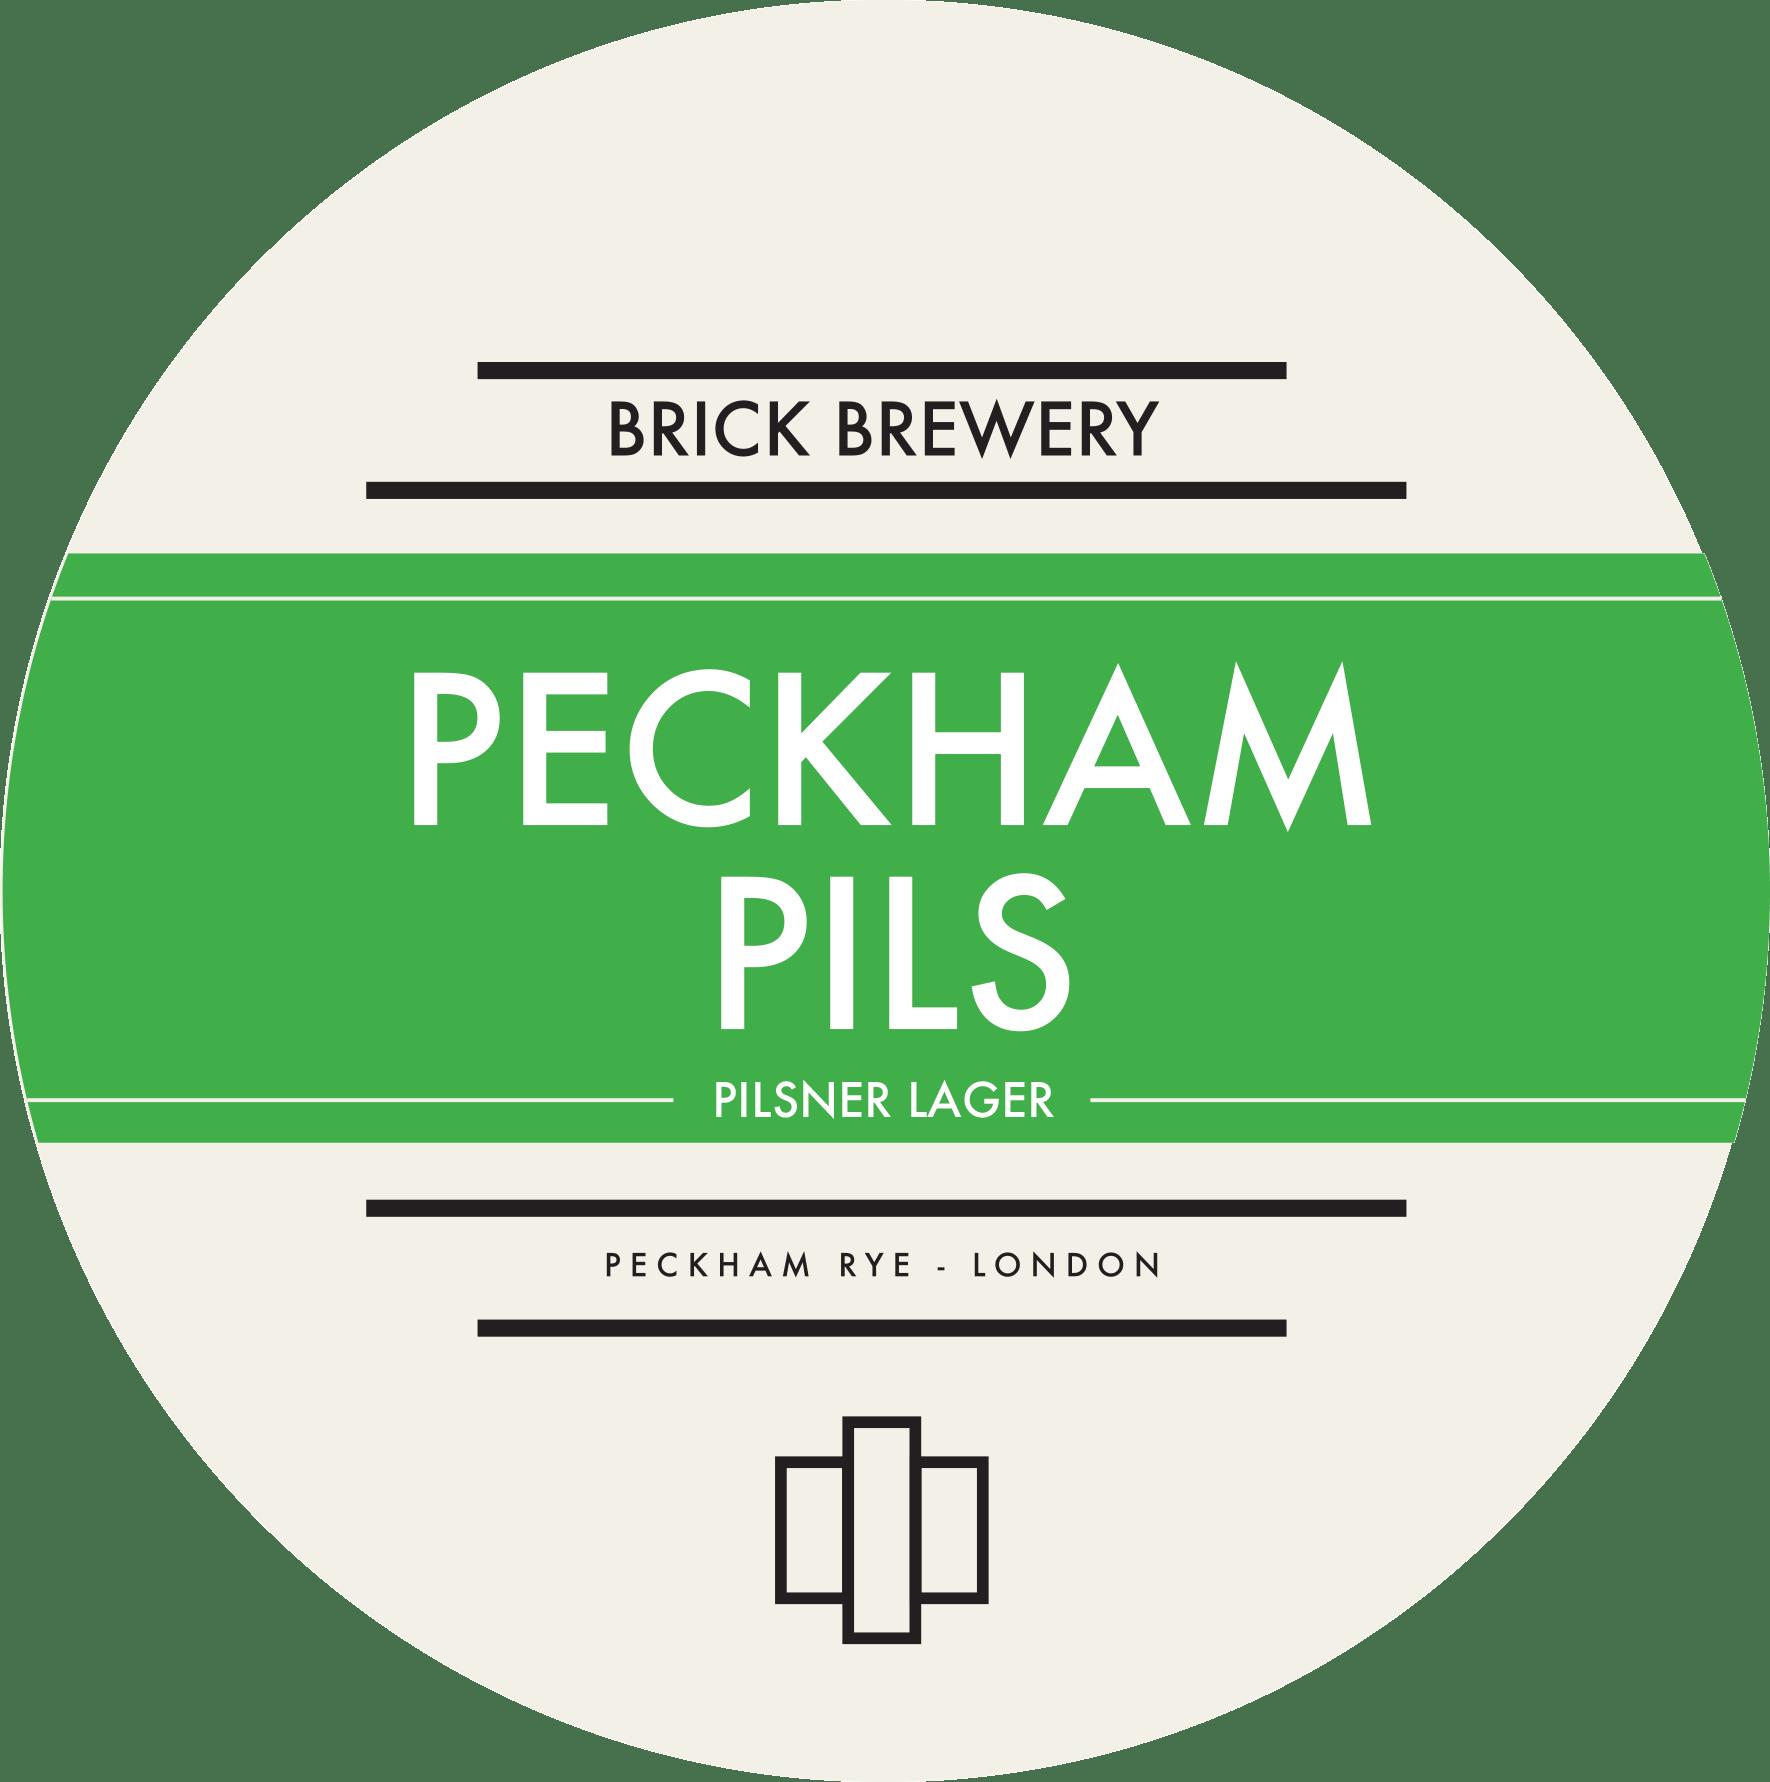 Brick Brewery's Peckham Pils Beer Logo